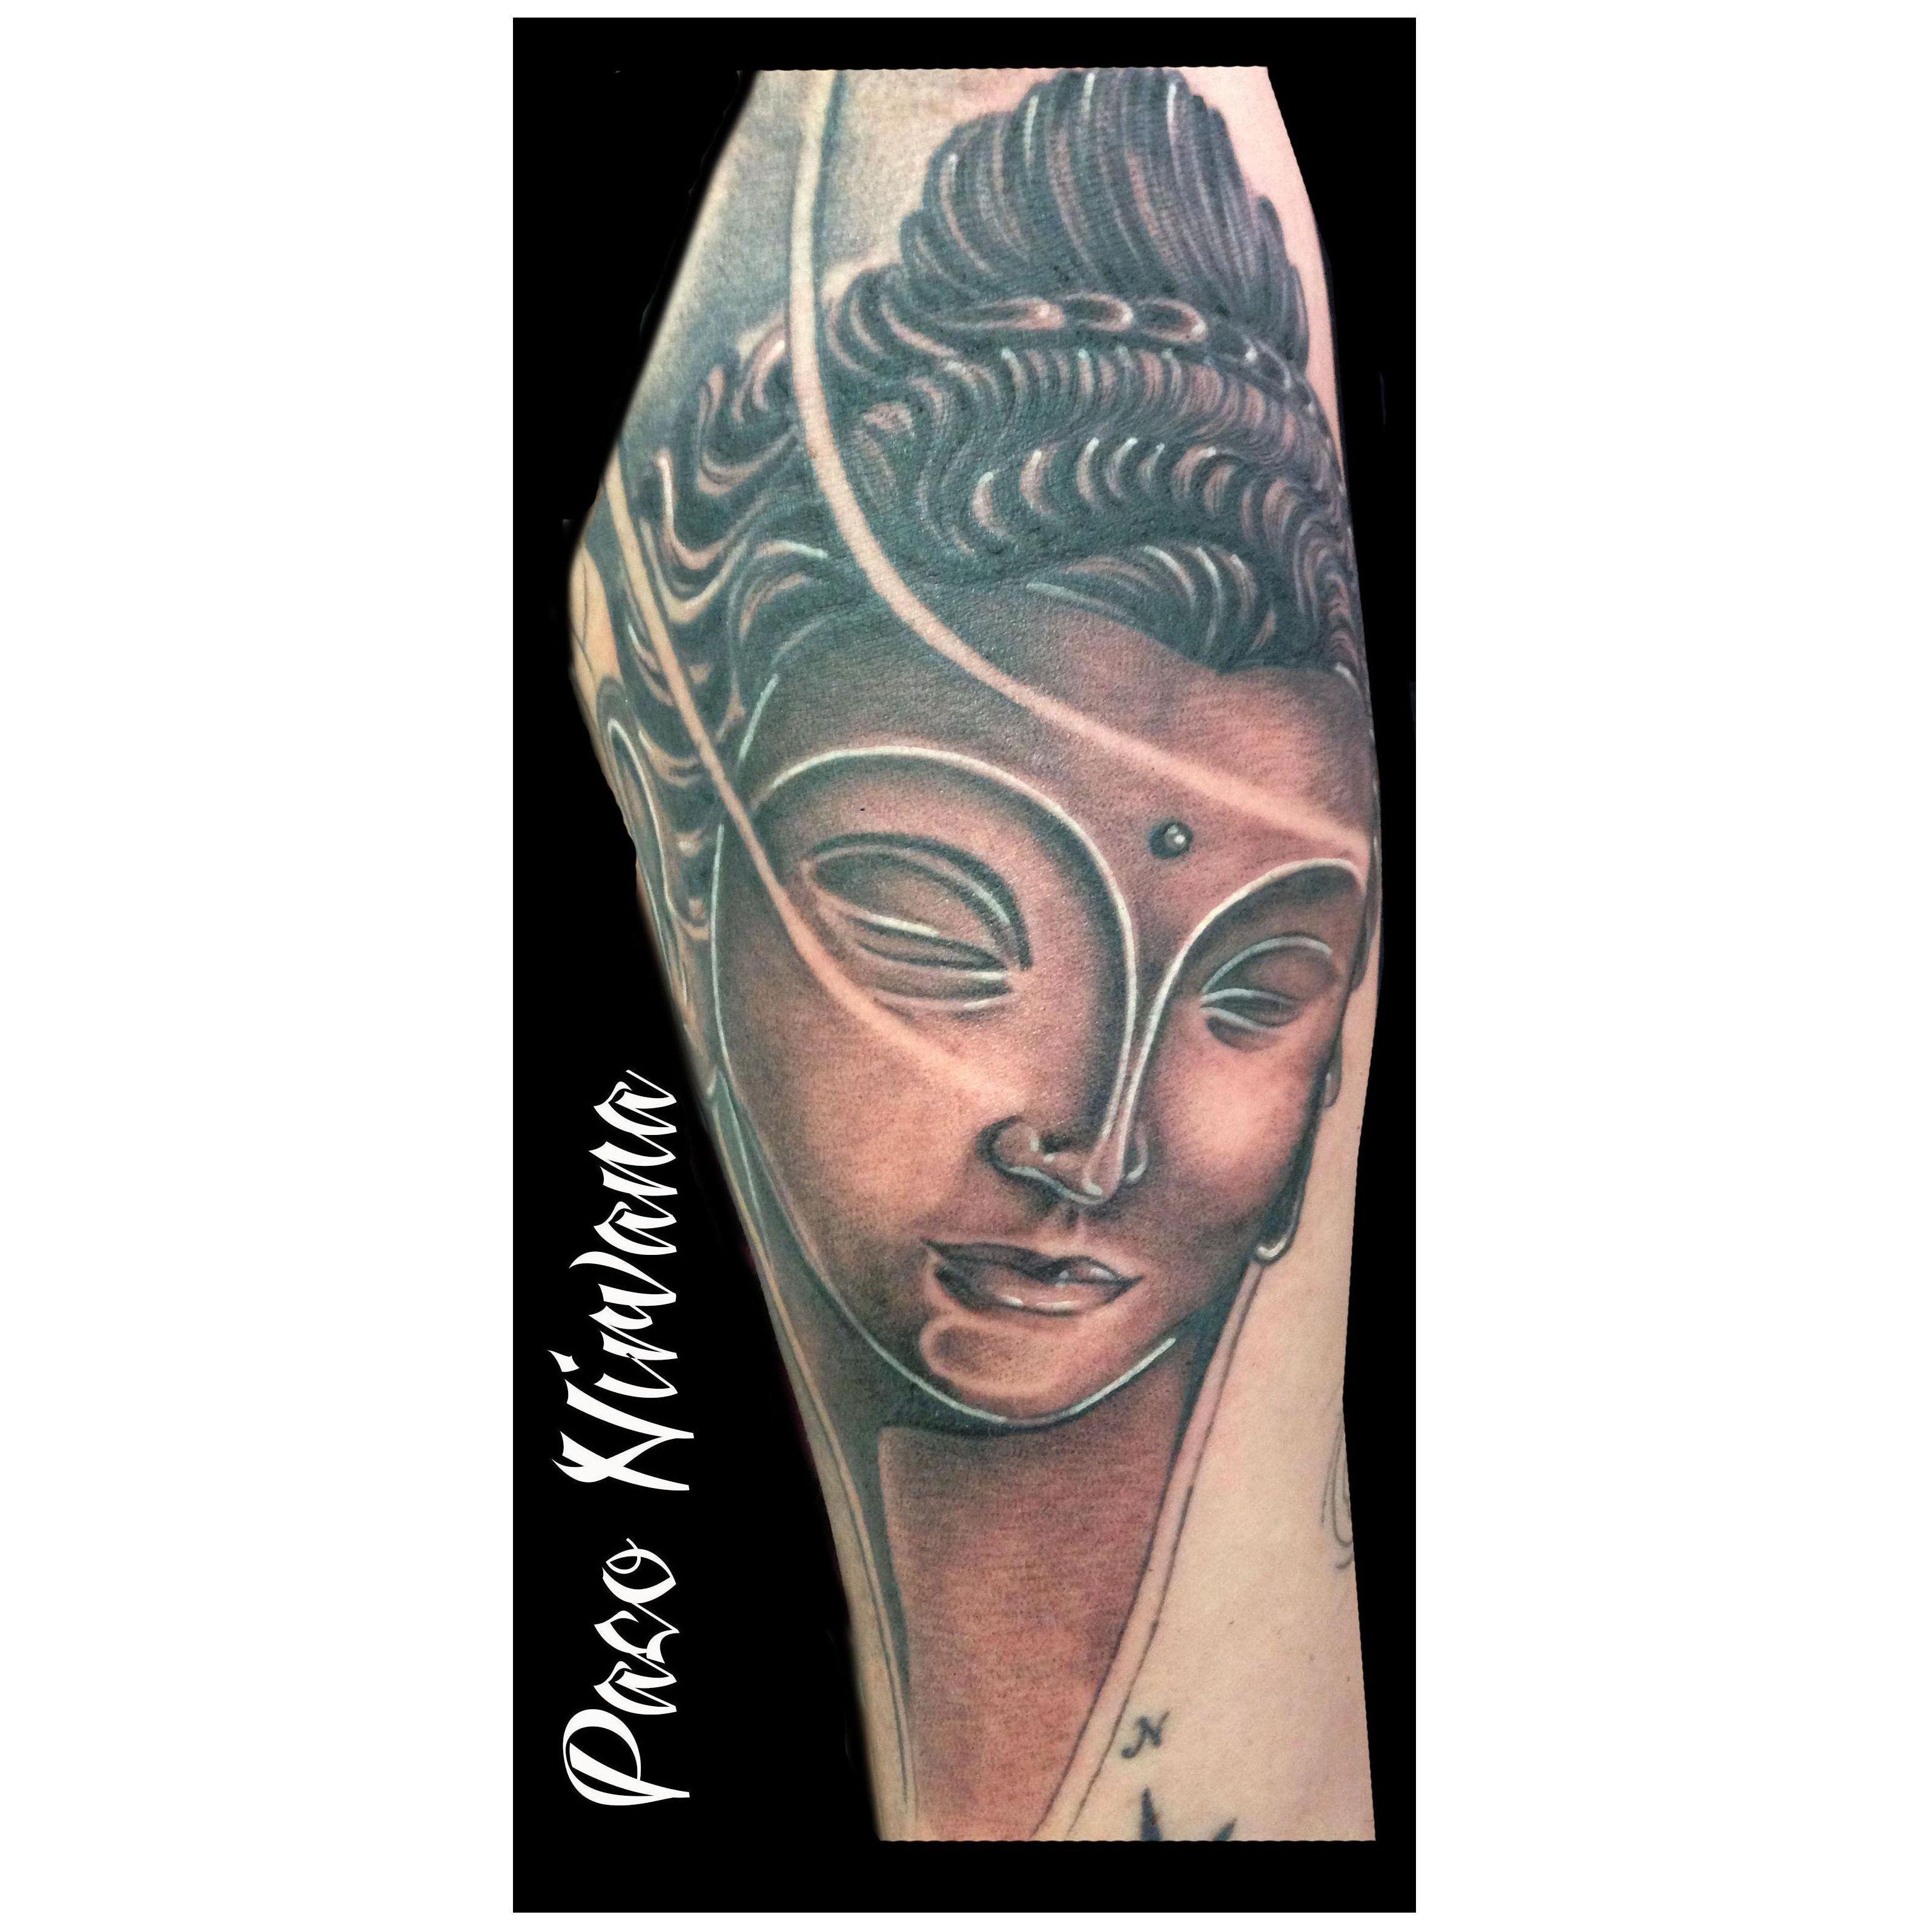 Tatuajes Realistas Tatuajes De Tattoo Piercing El Pako Donald